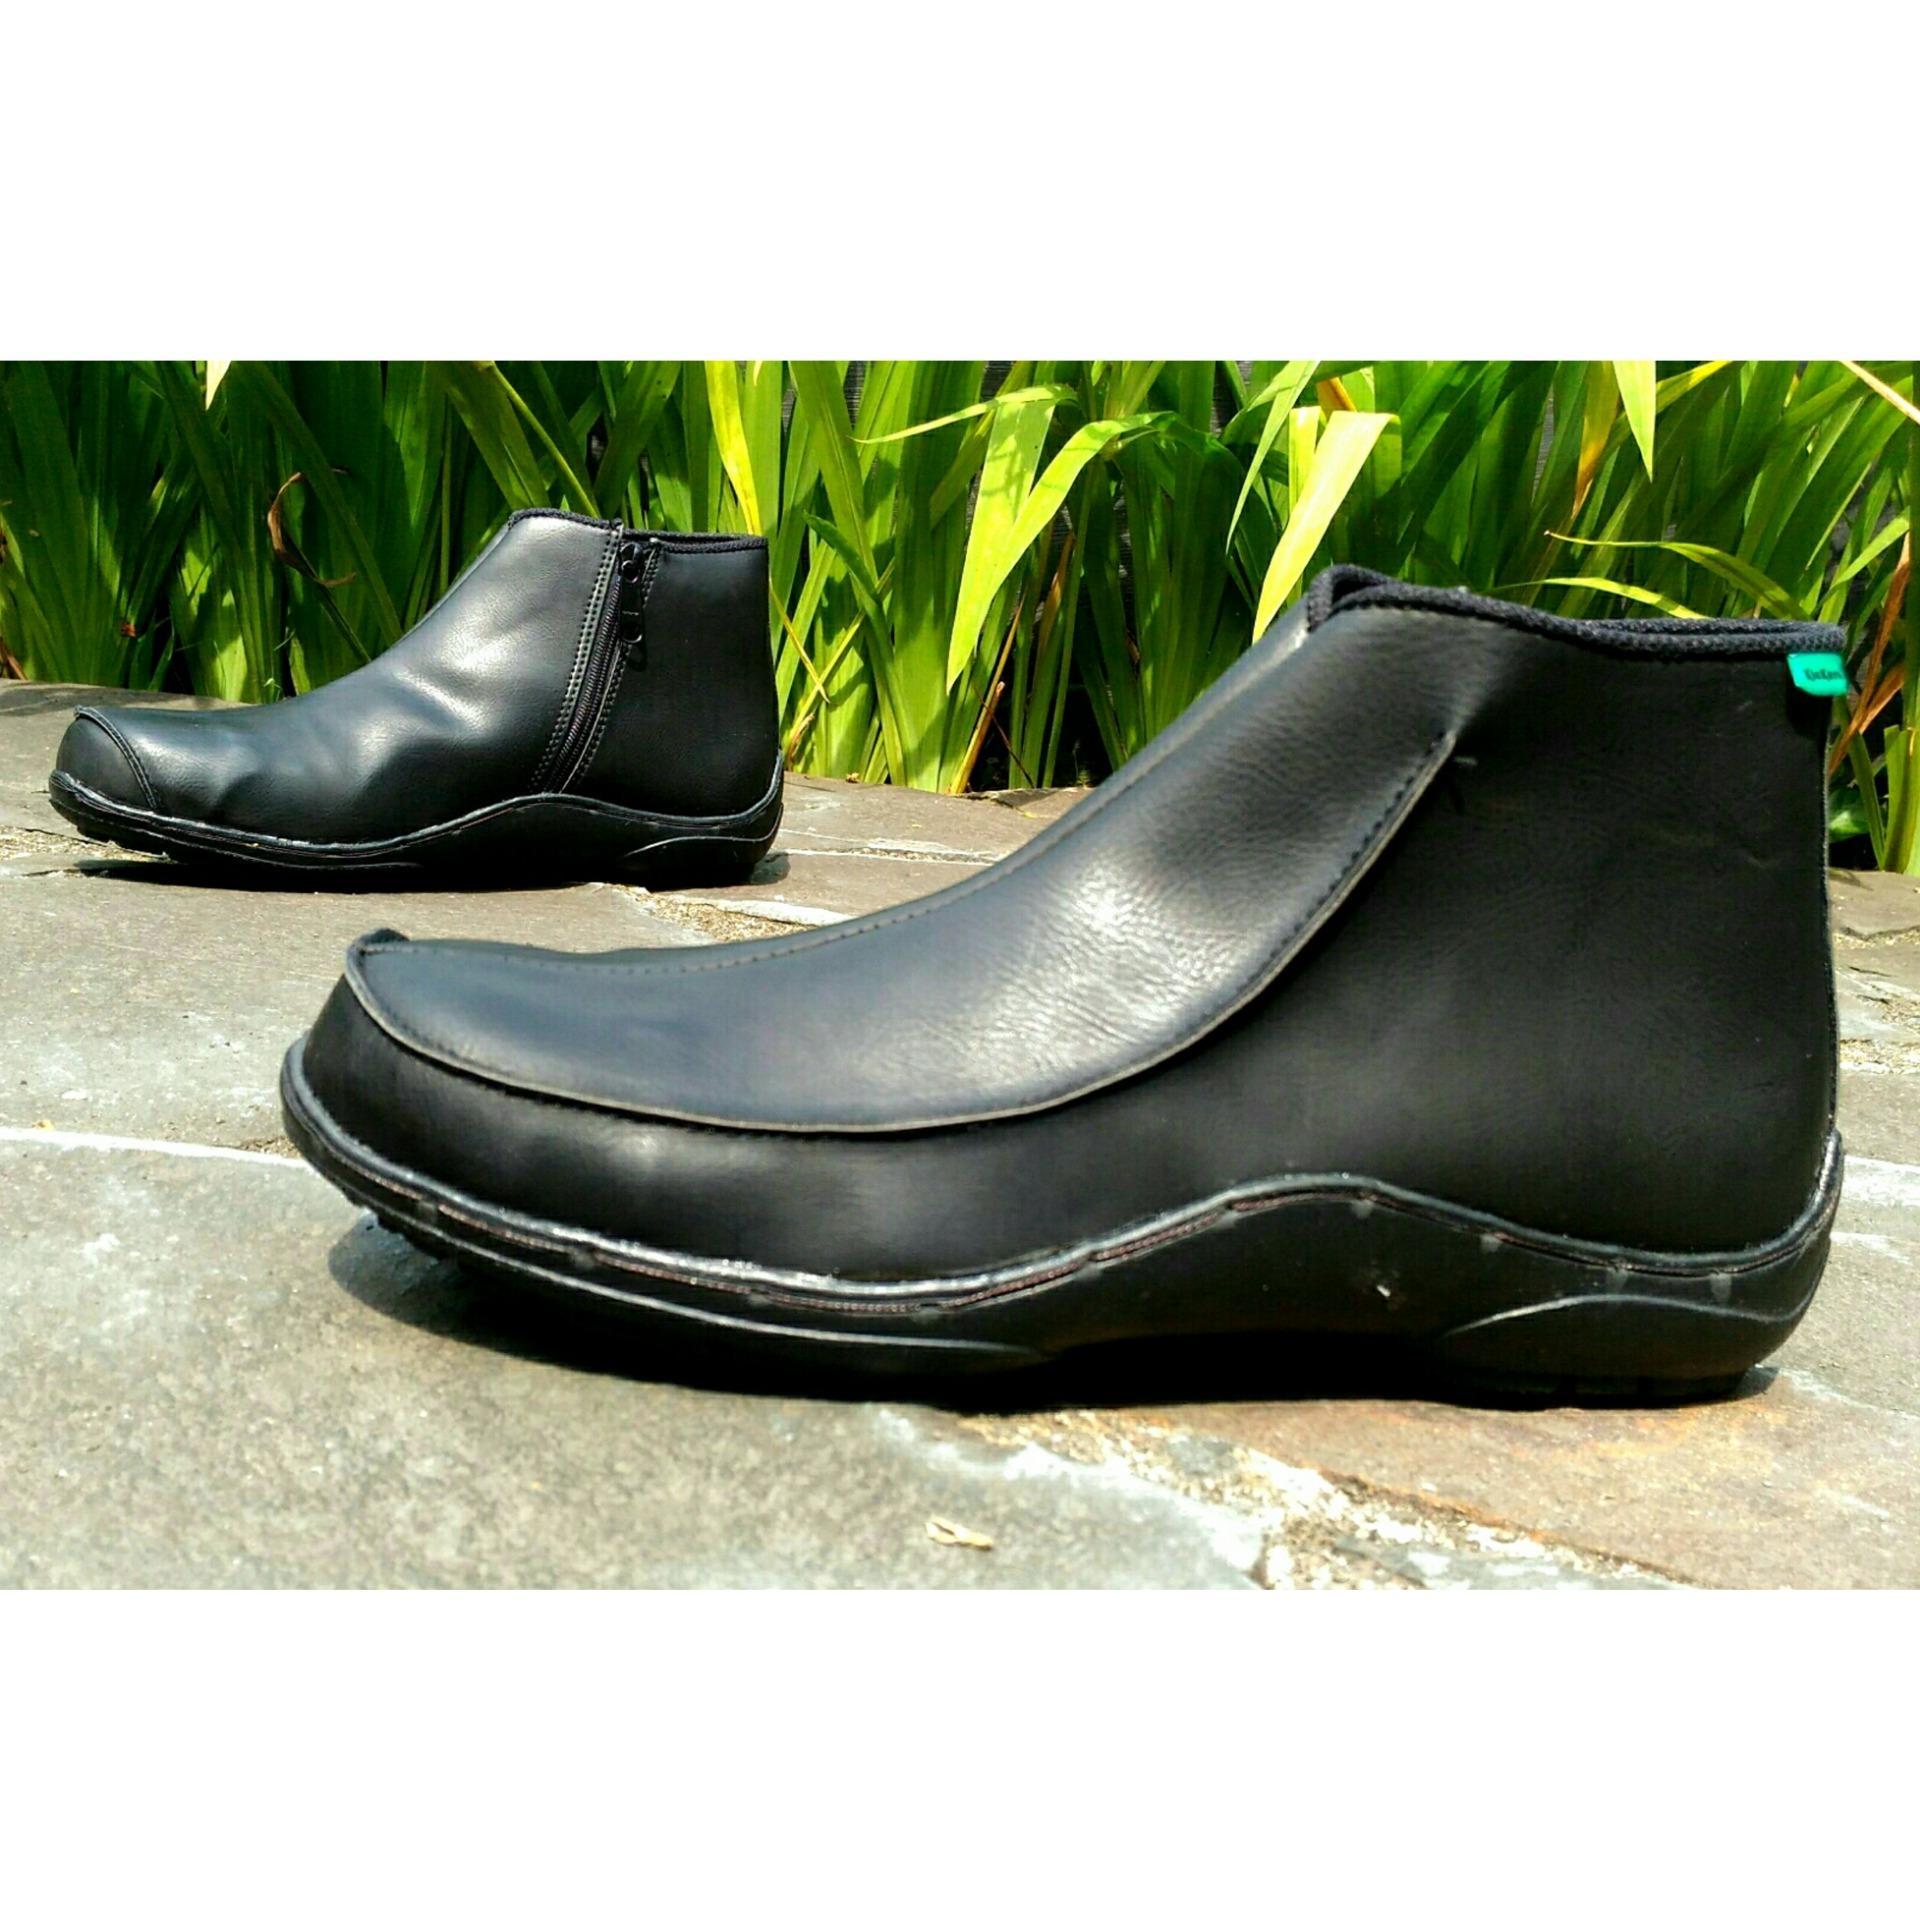 Kickers Safety Boots Valen Warna Coklat Tua Daftar Harga Terkini Source · Kickers Ninja Safety